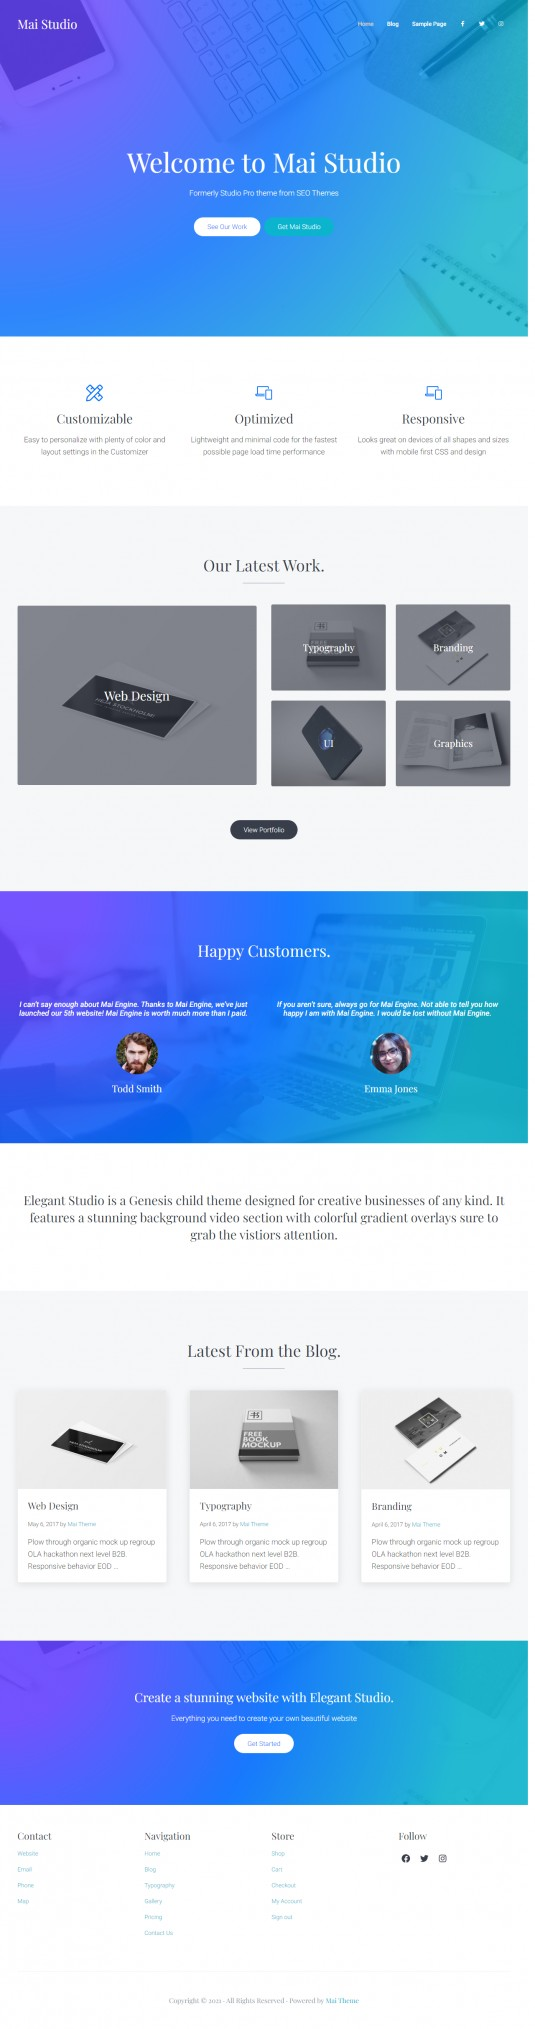 Mai Studio Theme Review by StudioPress - Best Business Theme